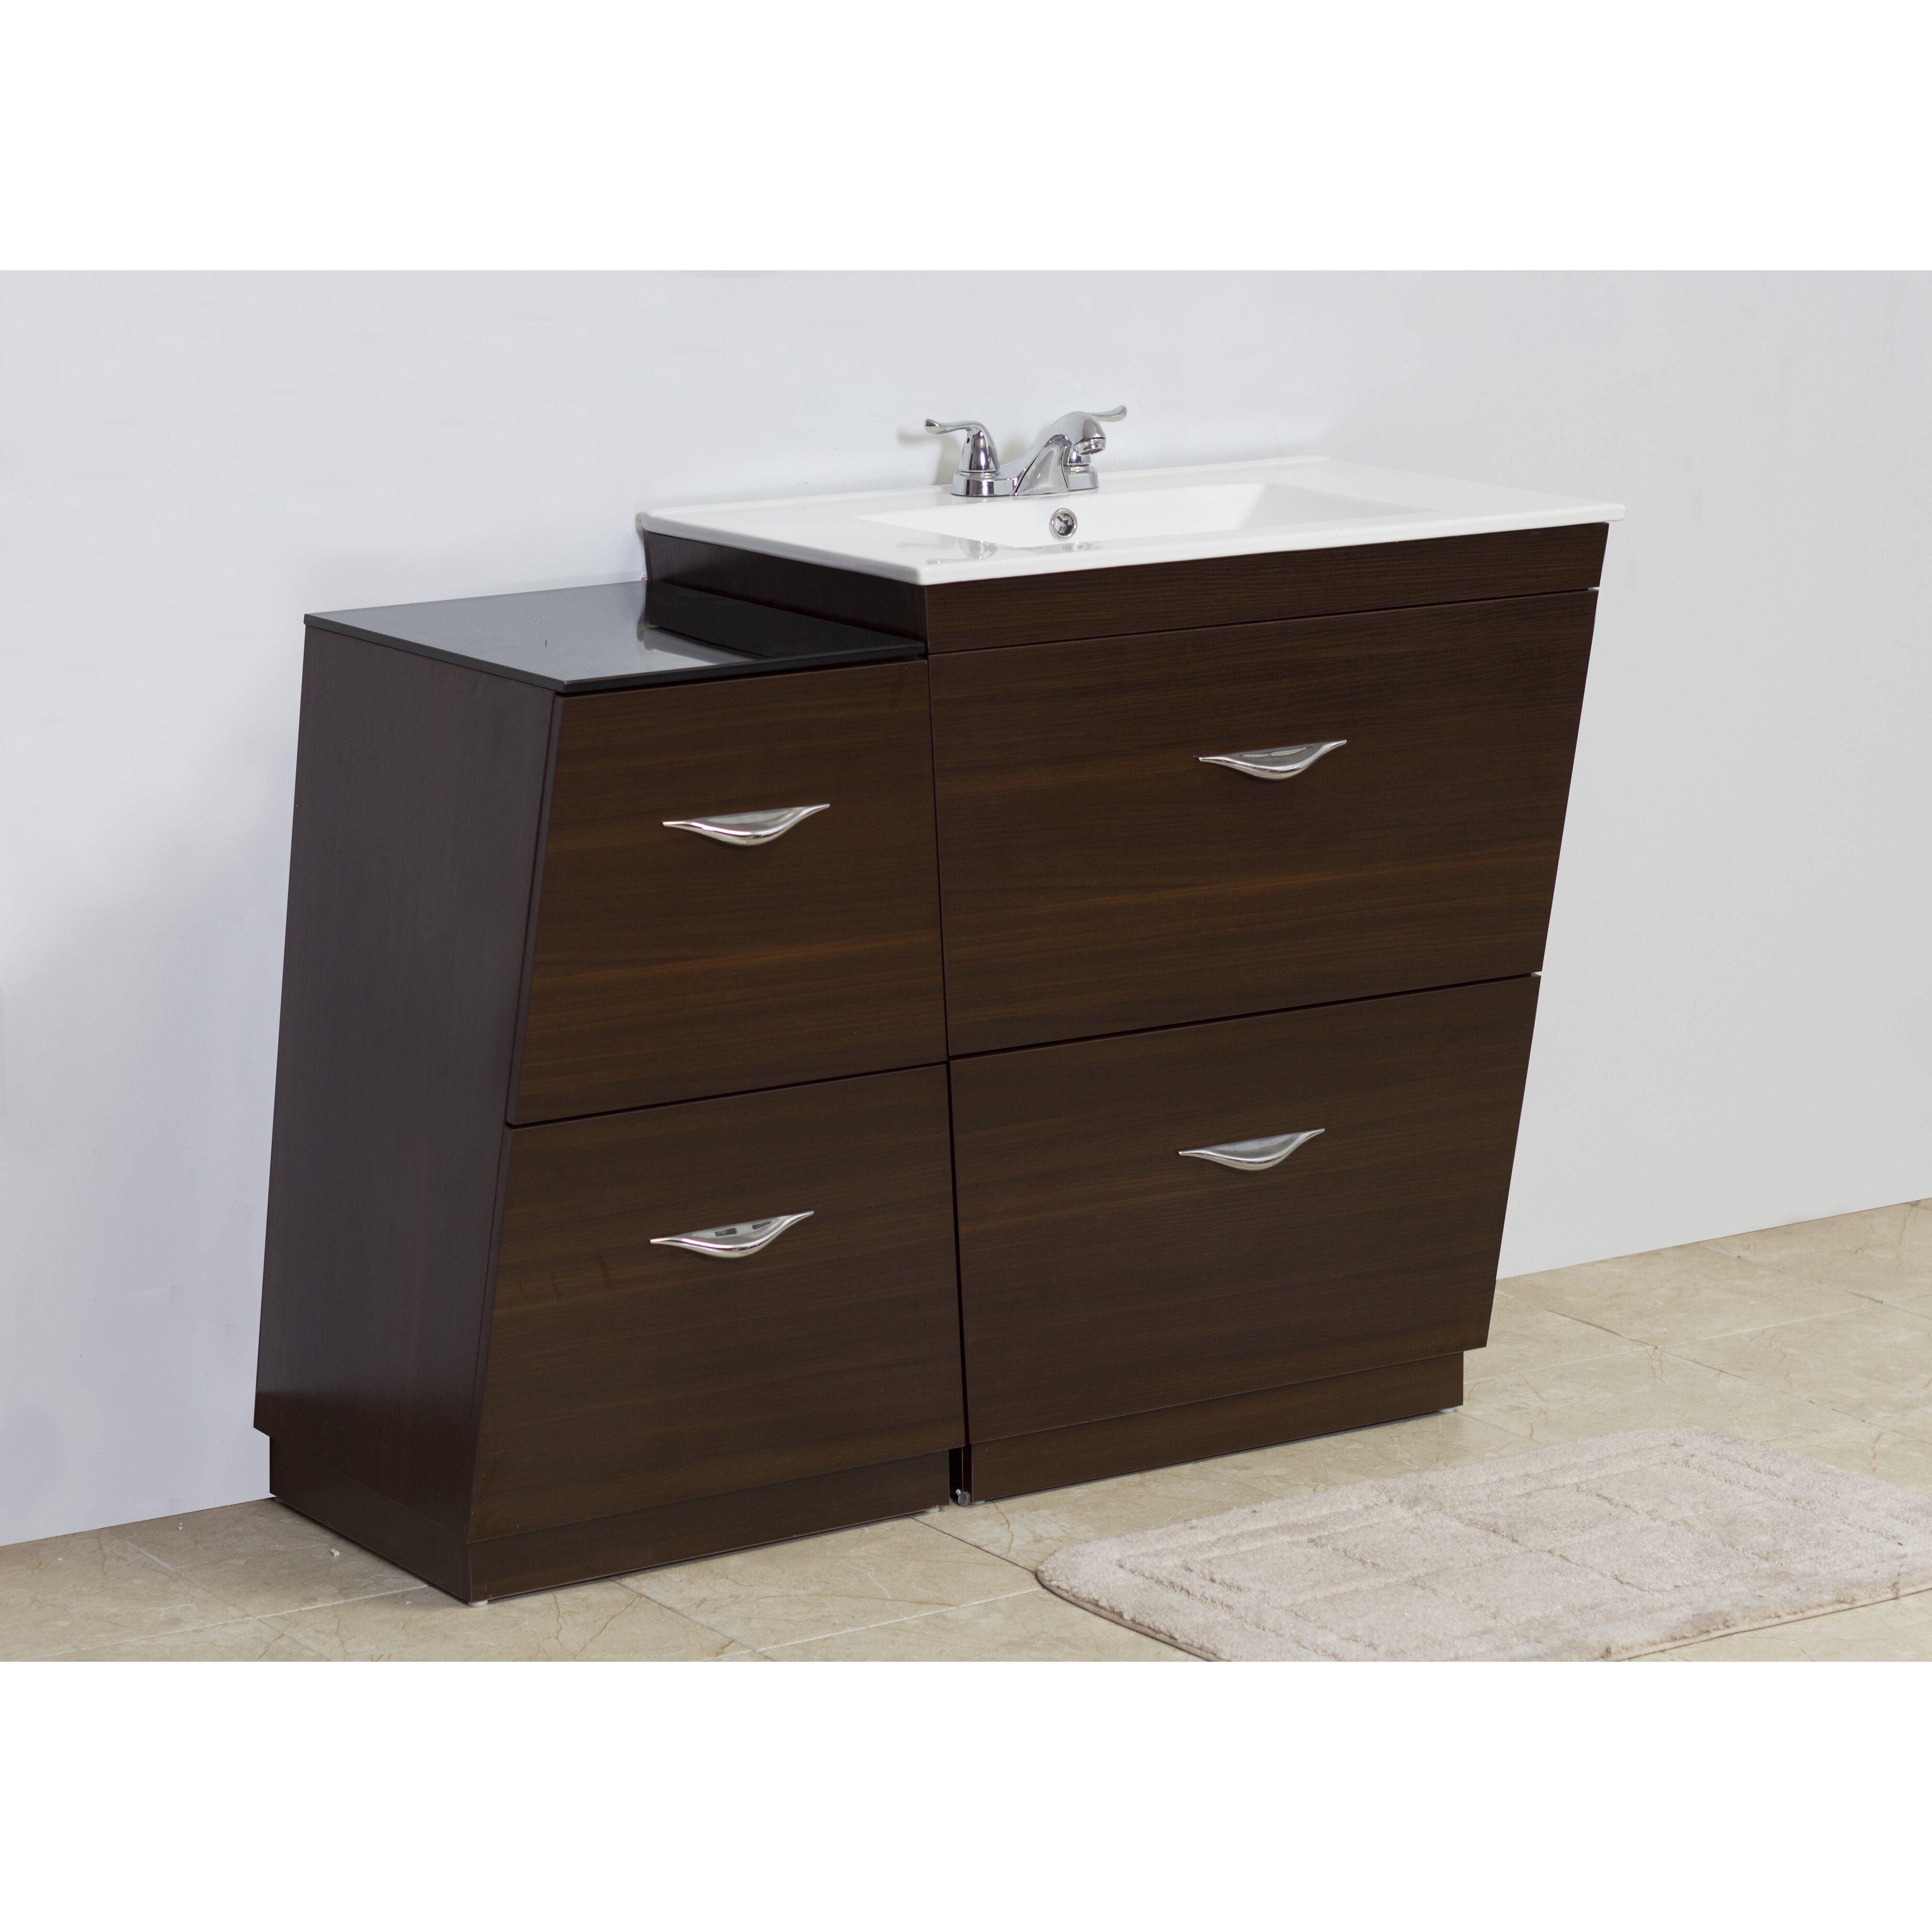 american imaginations 40 5 single modern bathroom vanity set reviews wayfair. Black Bedroom Furniture Sets. Home Design Ideas